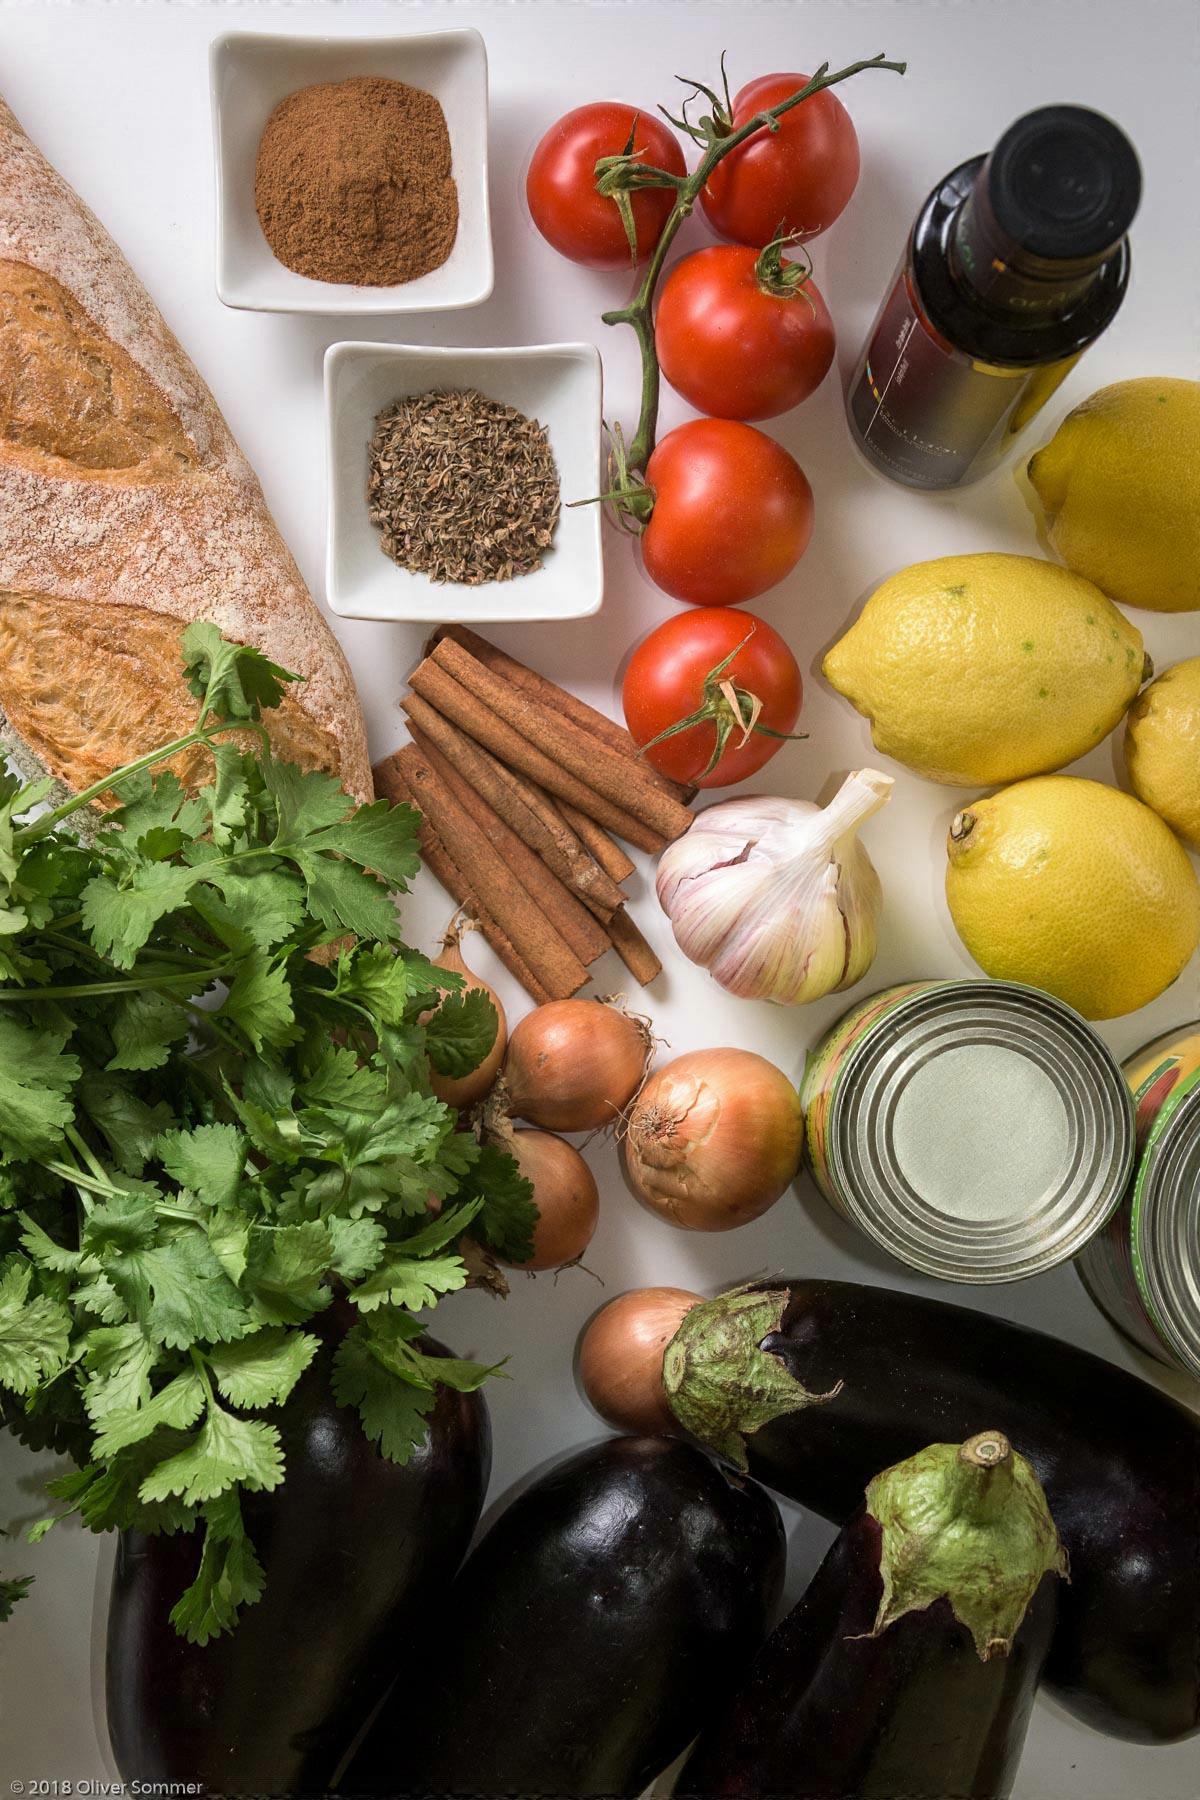 Cilantro, Cinnamon stick, Eggplant, Lemon, Tomatoes